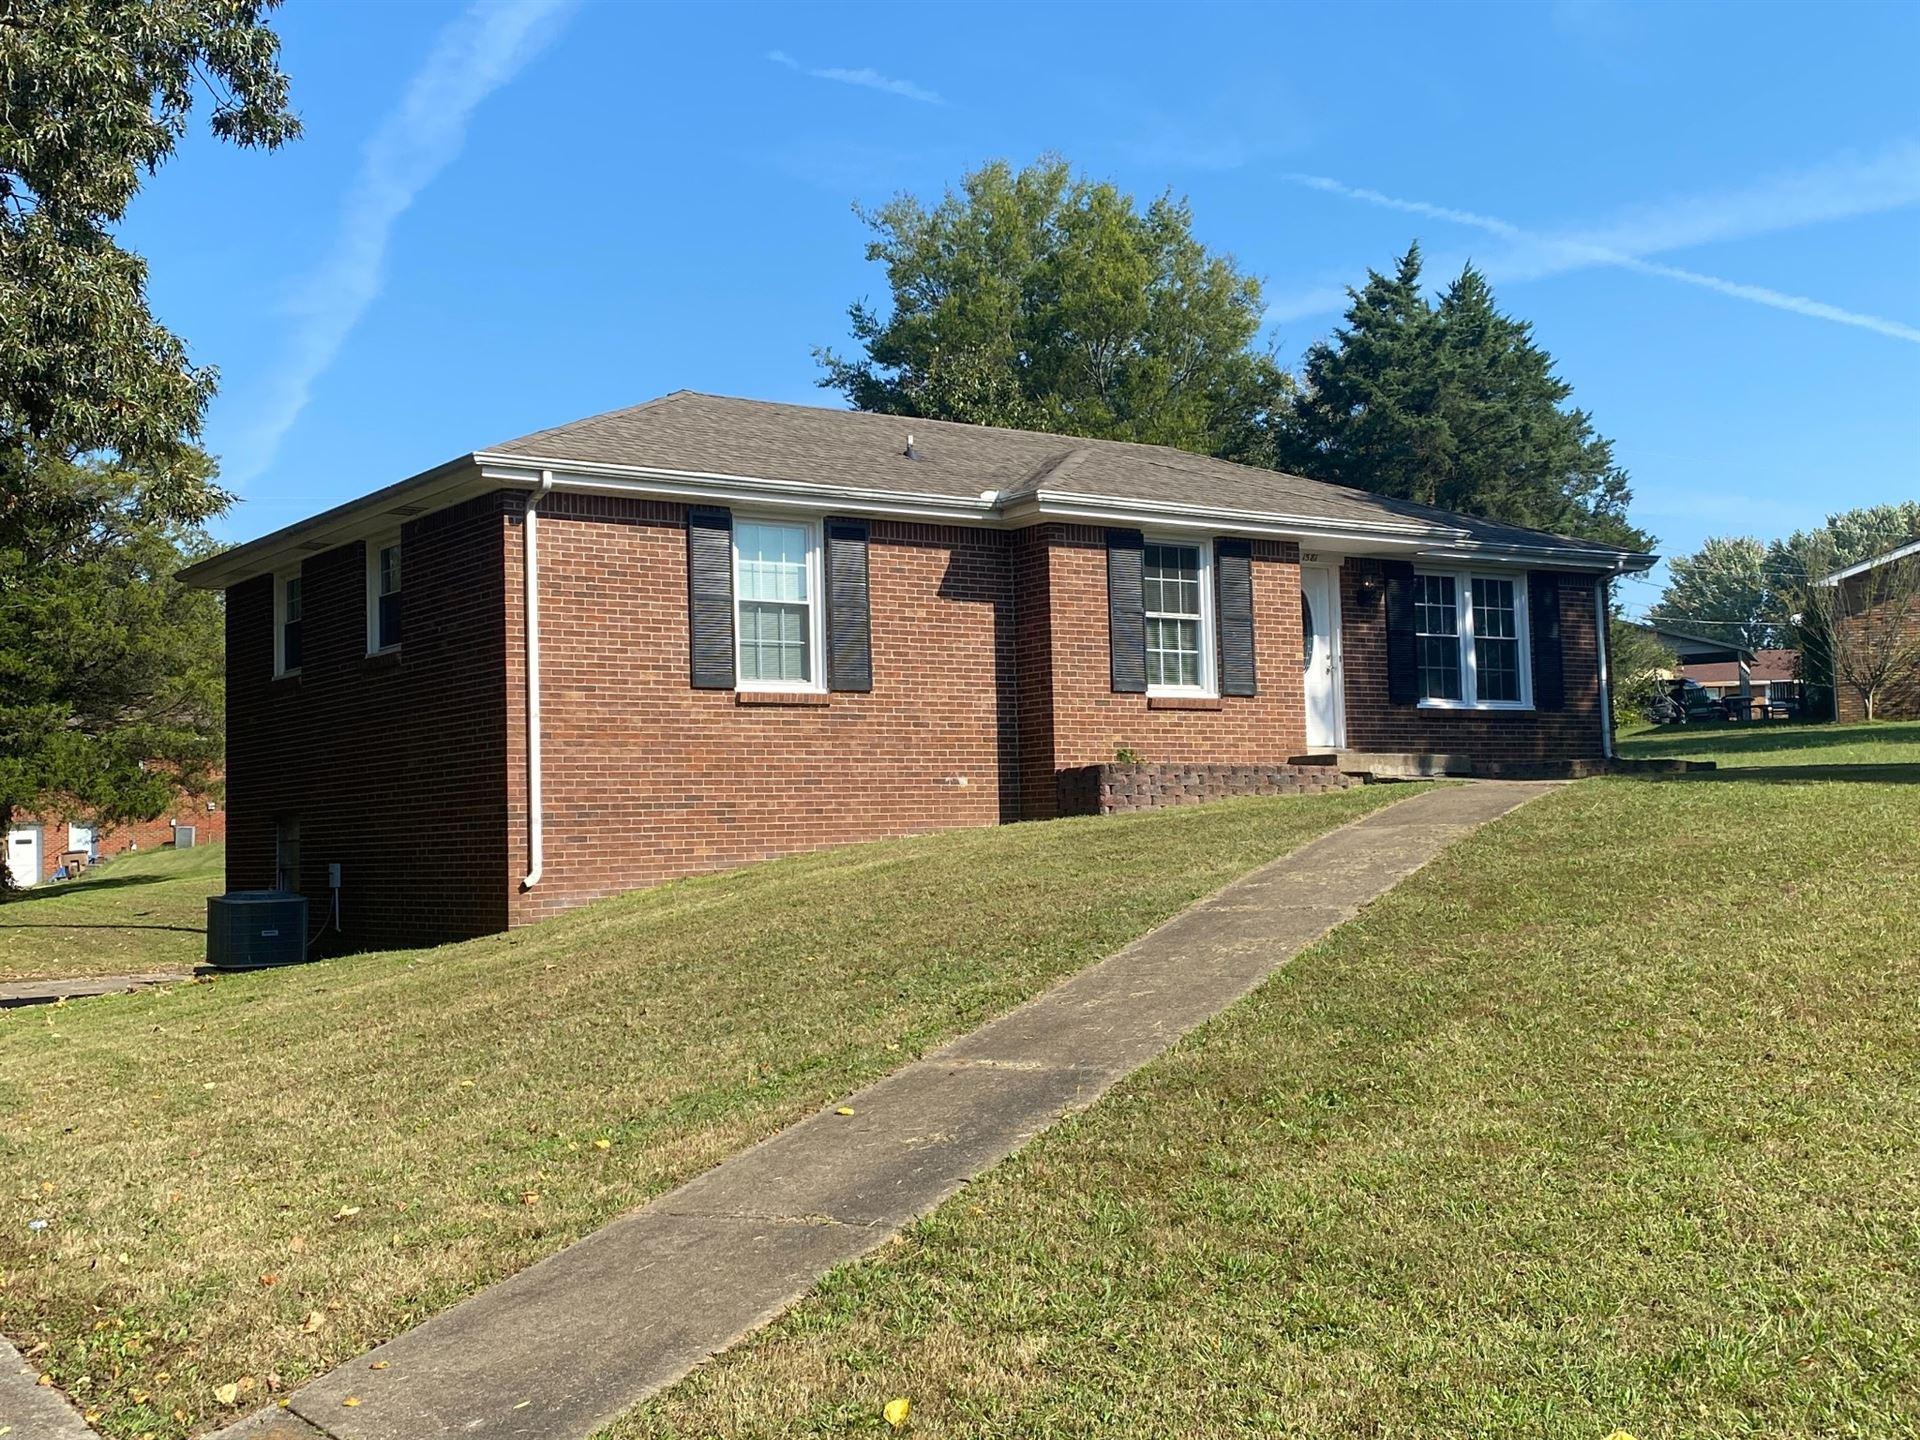 1581 Cherry Tree Dr, Clarksville, TN 37042 - MLS#: 2299533